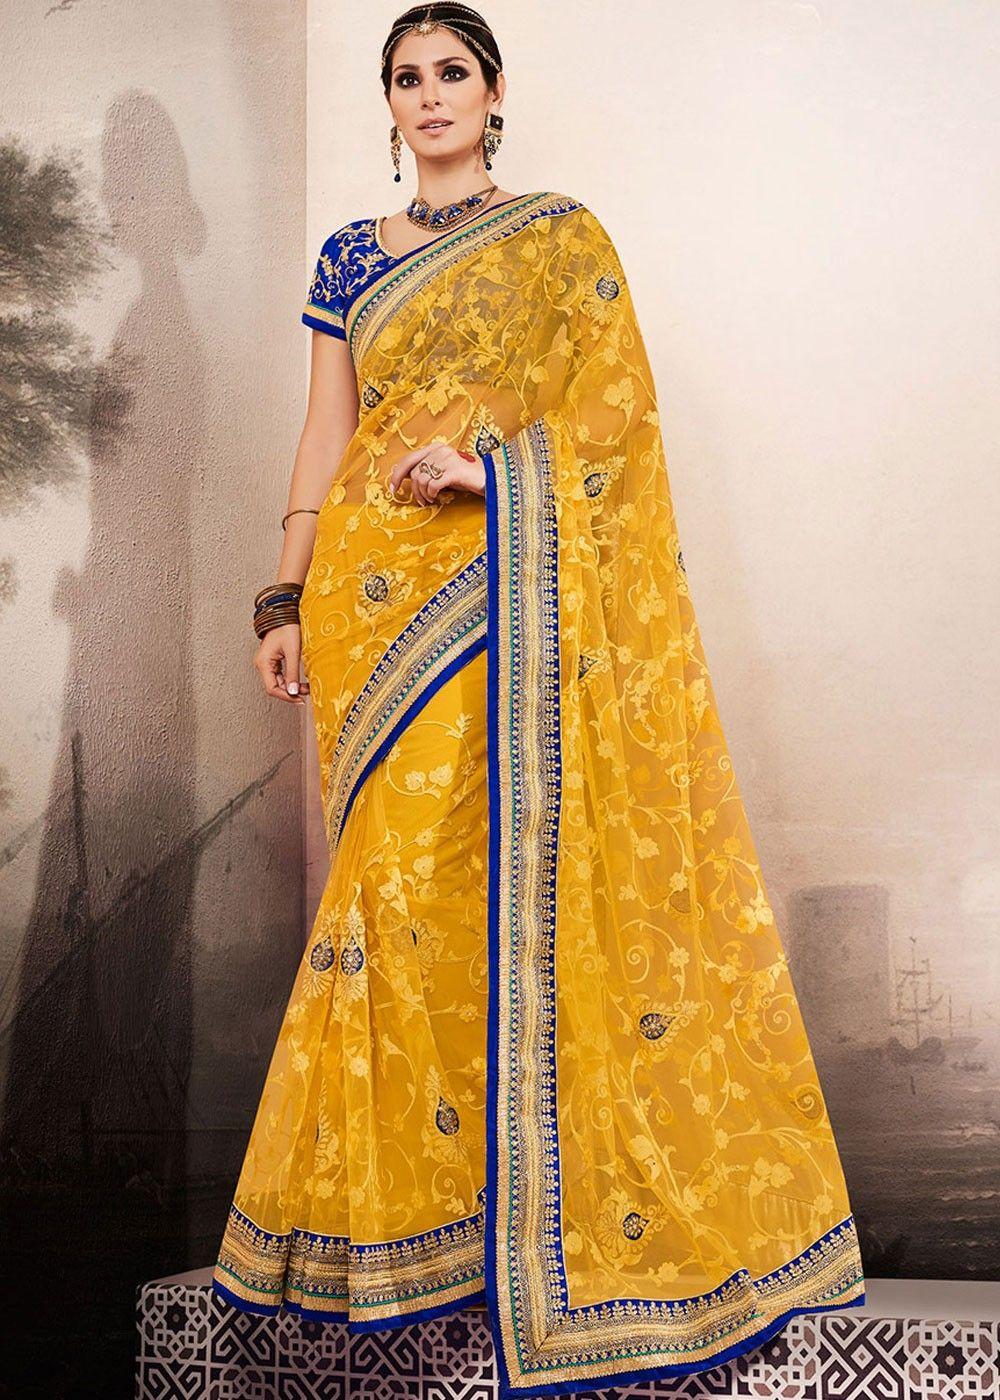 Bruna Laila bruna abdullah embroidered net saree in yellow | bollywood